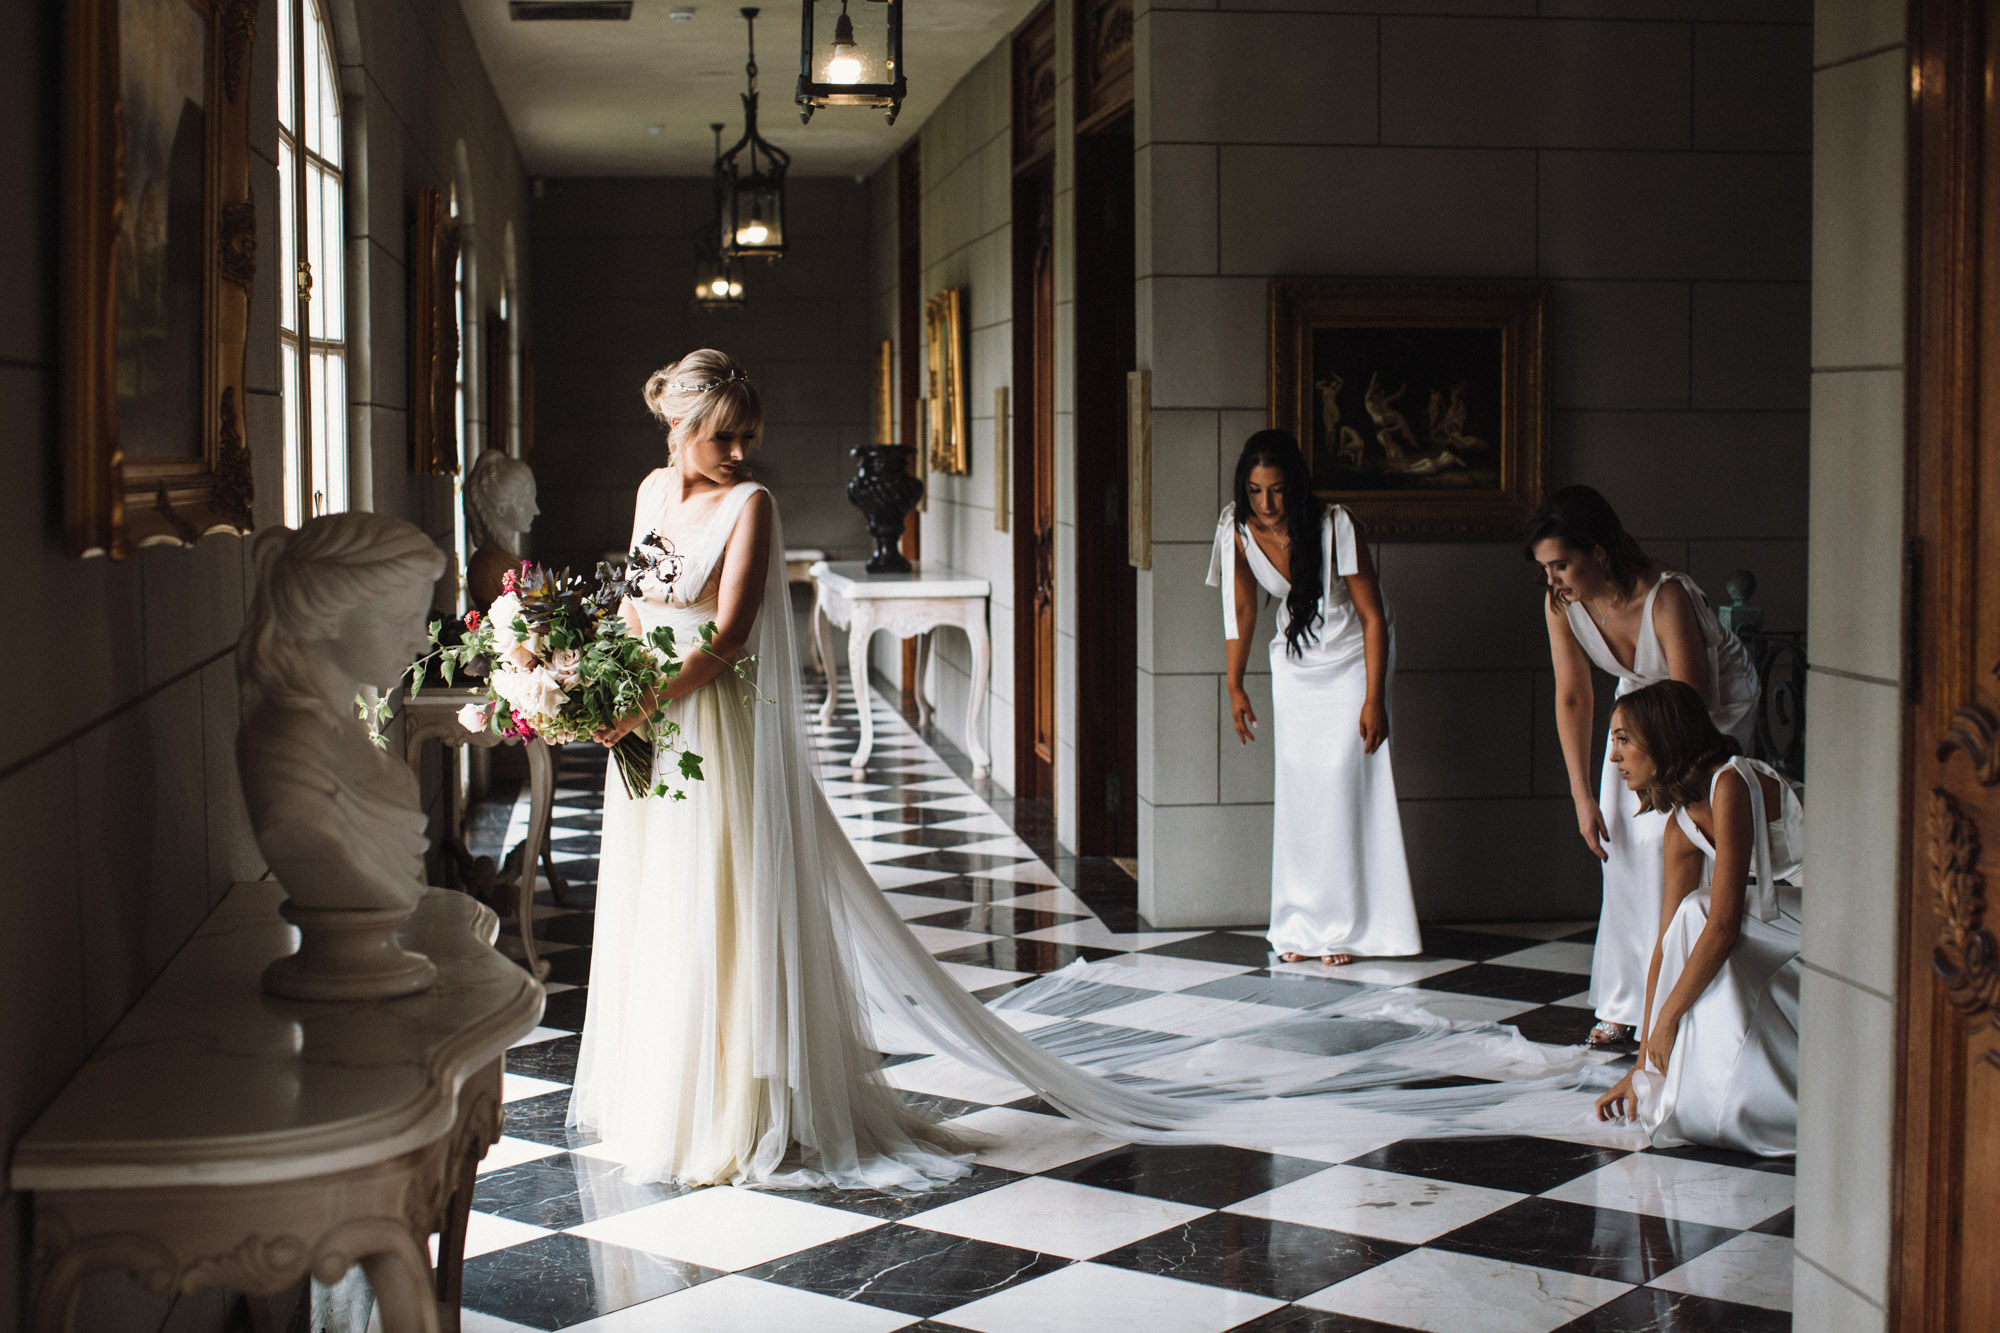 Campbell Point House Wedding HJ + Dean Raphael Weddings-57.jpg